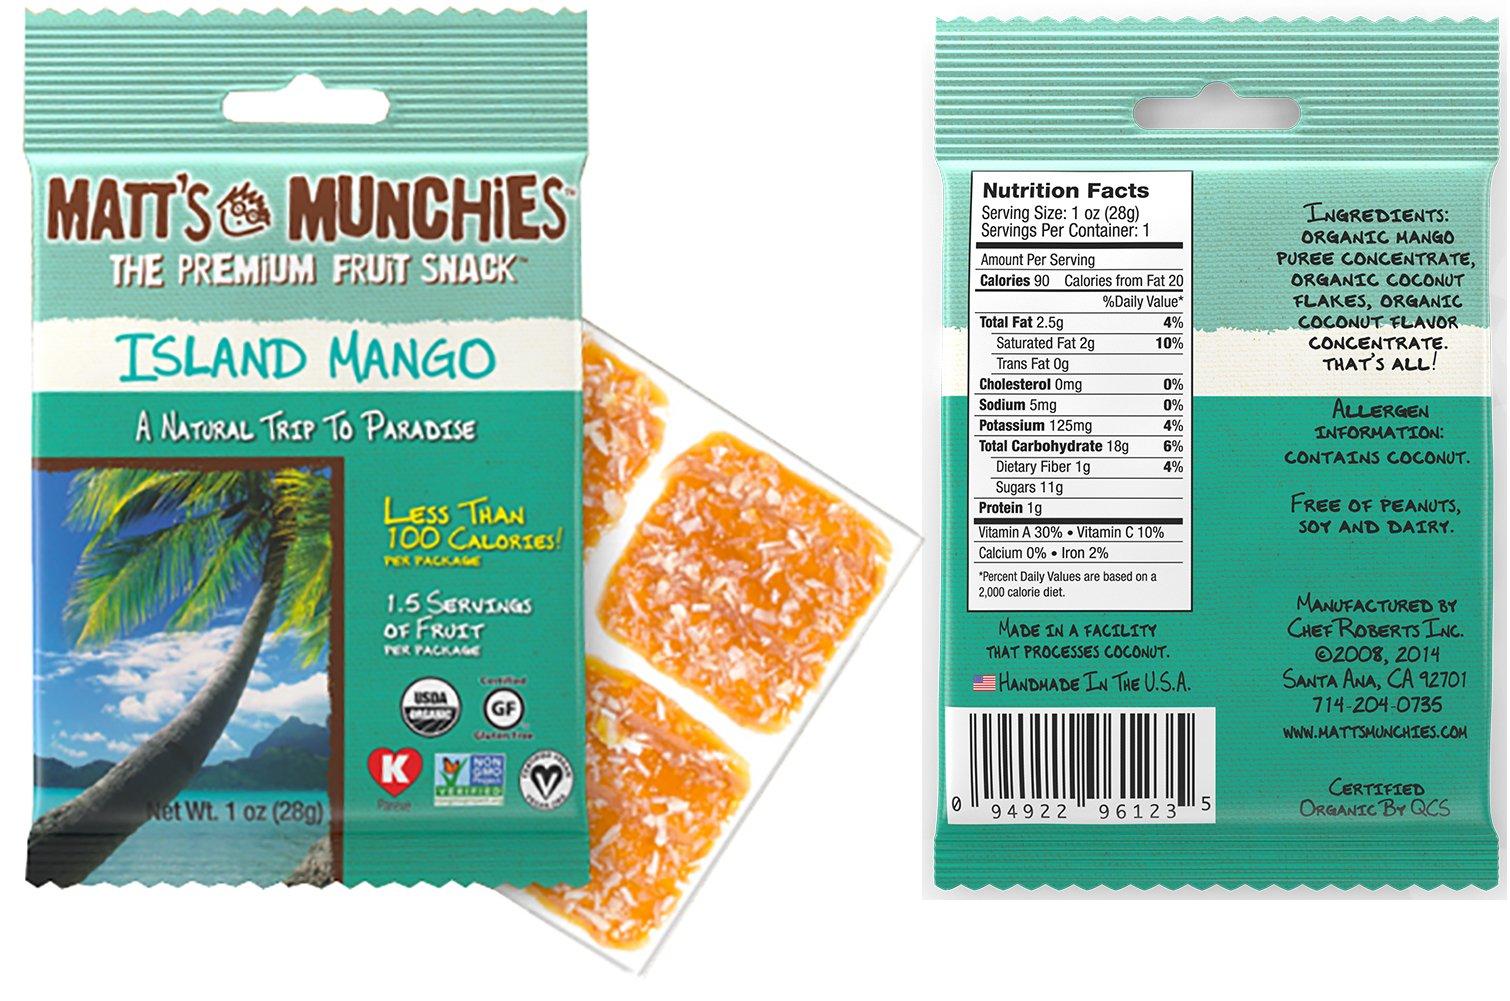 Matt's Munchies Tropical Assortment Organic Non-GMO Fruit Leather Peelable Fruit Snacks 25 Count Variety Pack Caddy - Mango, Island Mango, Tropical Punch, Banana Coconut & Apple by Matt's Munchies (Image #4)